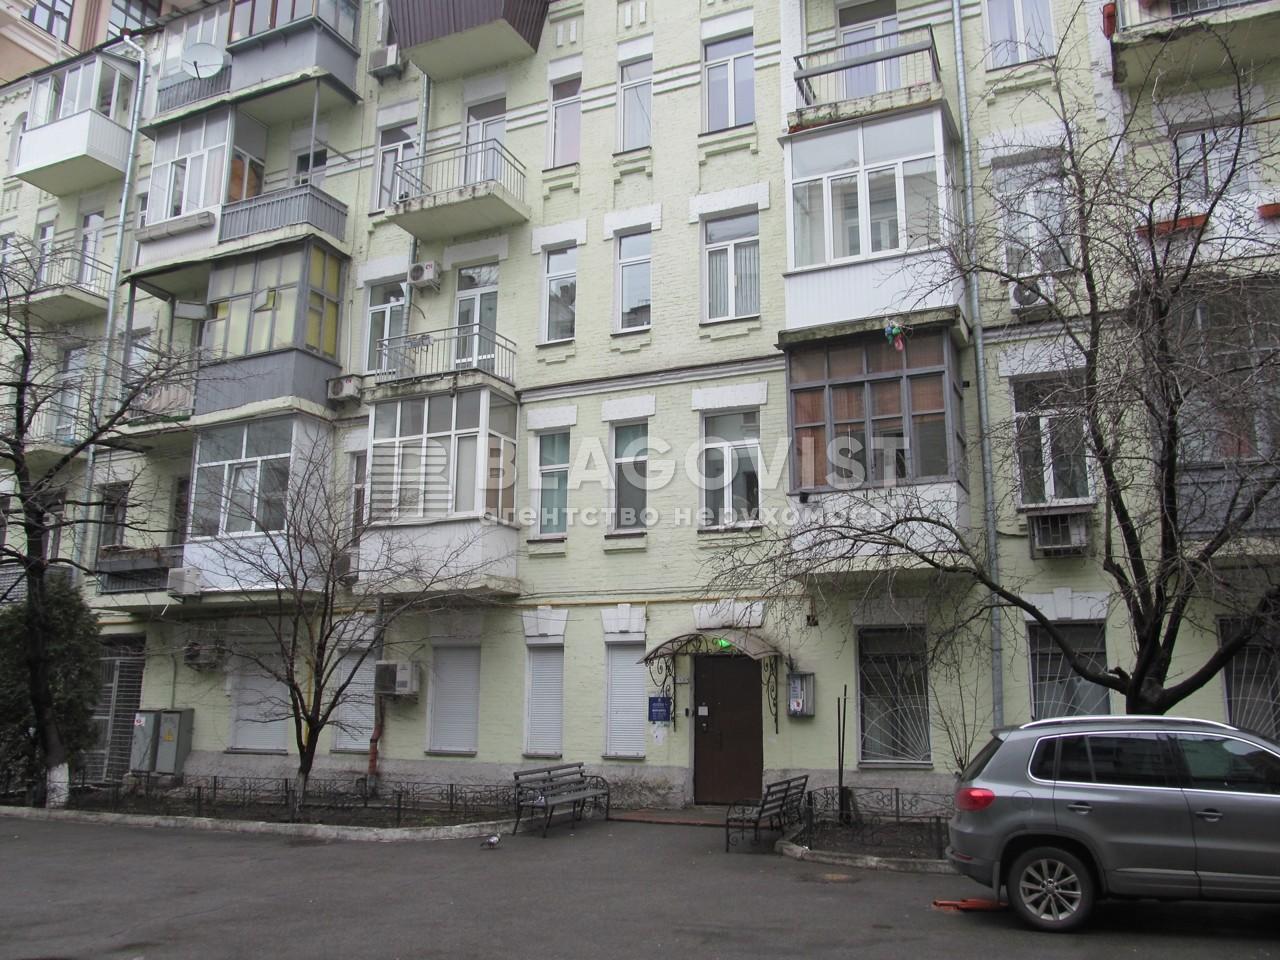 Квартира C-82921, Саксаганского, 102б, Киев - Фото 2